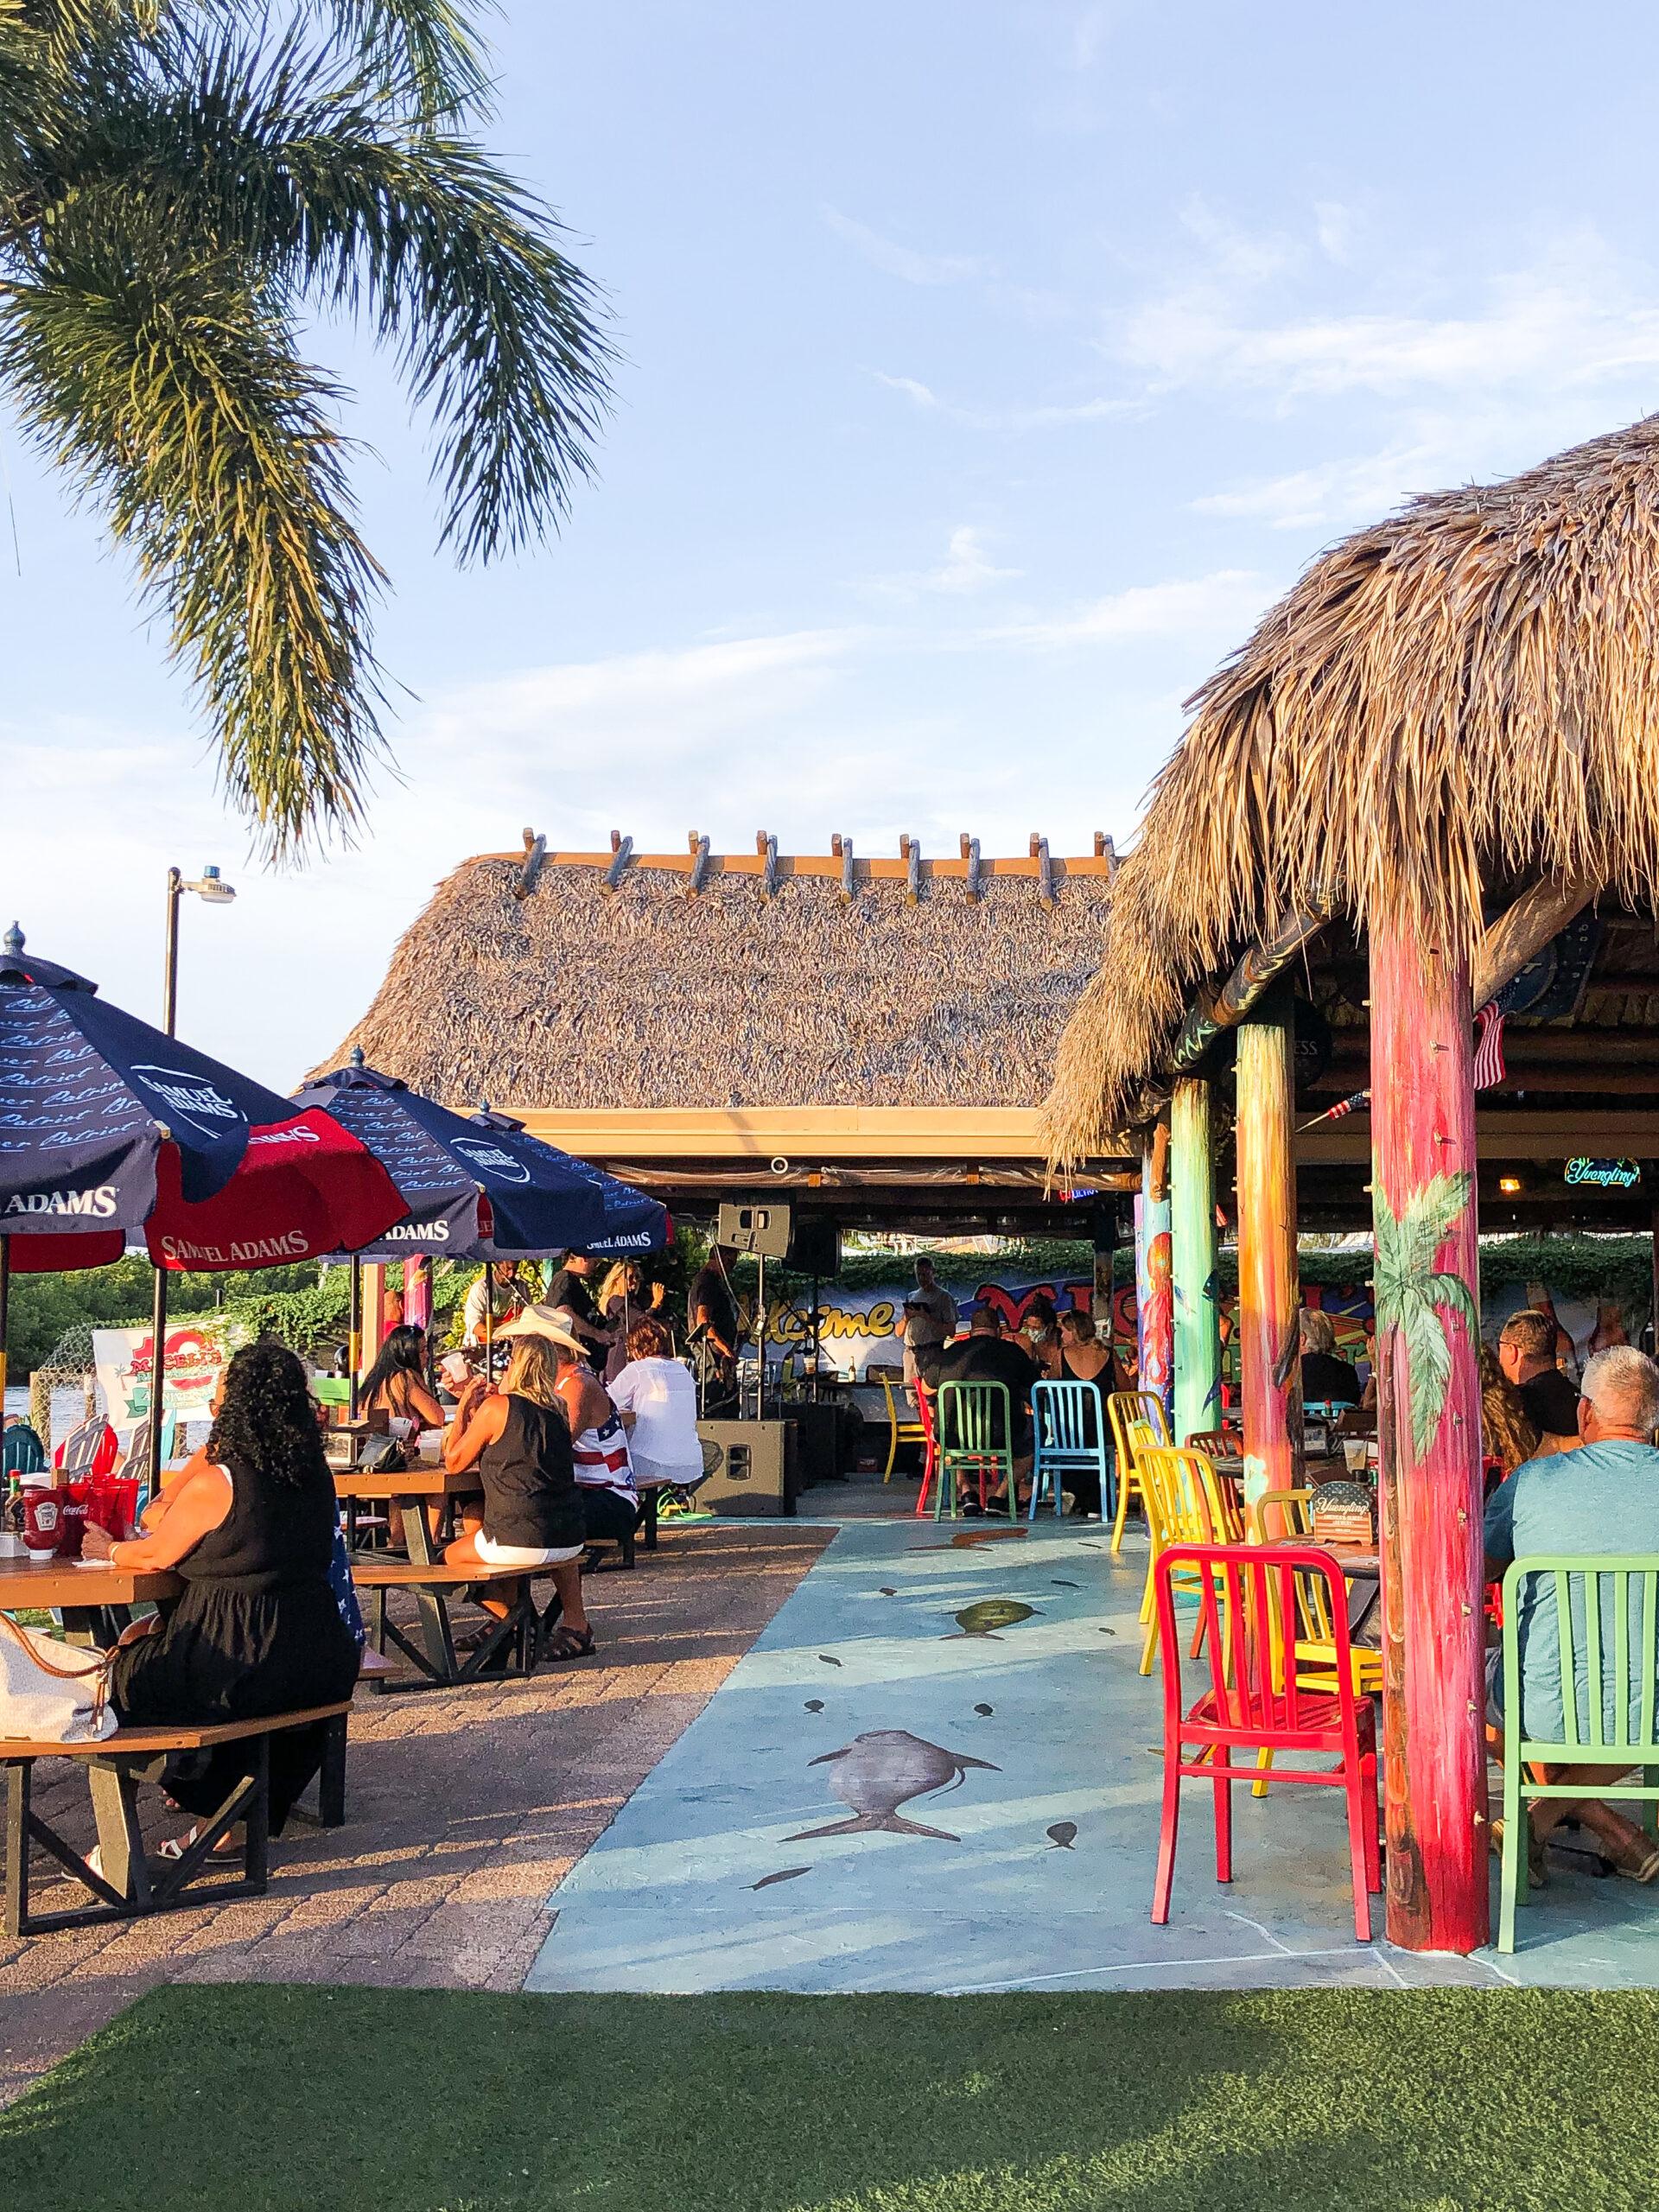 Rosie Andre - Bonita Beach, Florida (travel guide, south west Florida, Florida, swfl, Bonita Beach, USA)